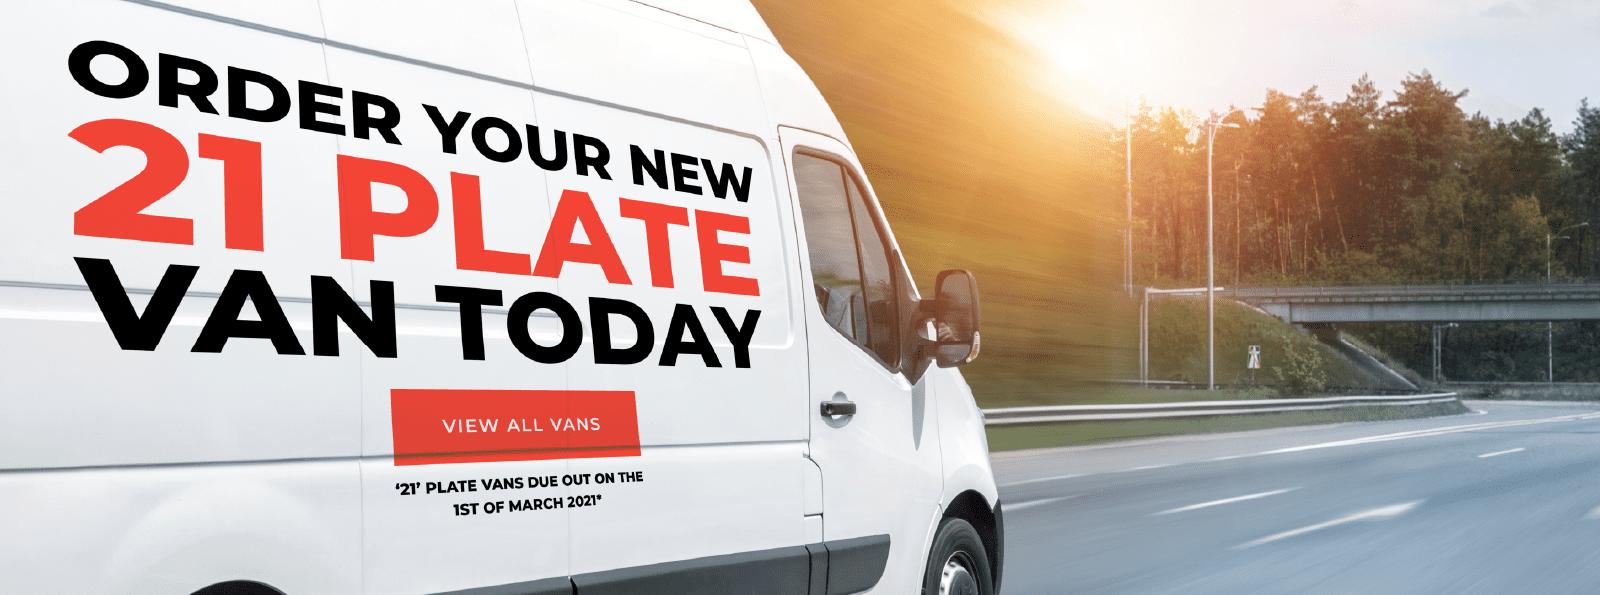 Order Your New 21 Plate Van Today